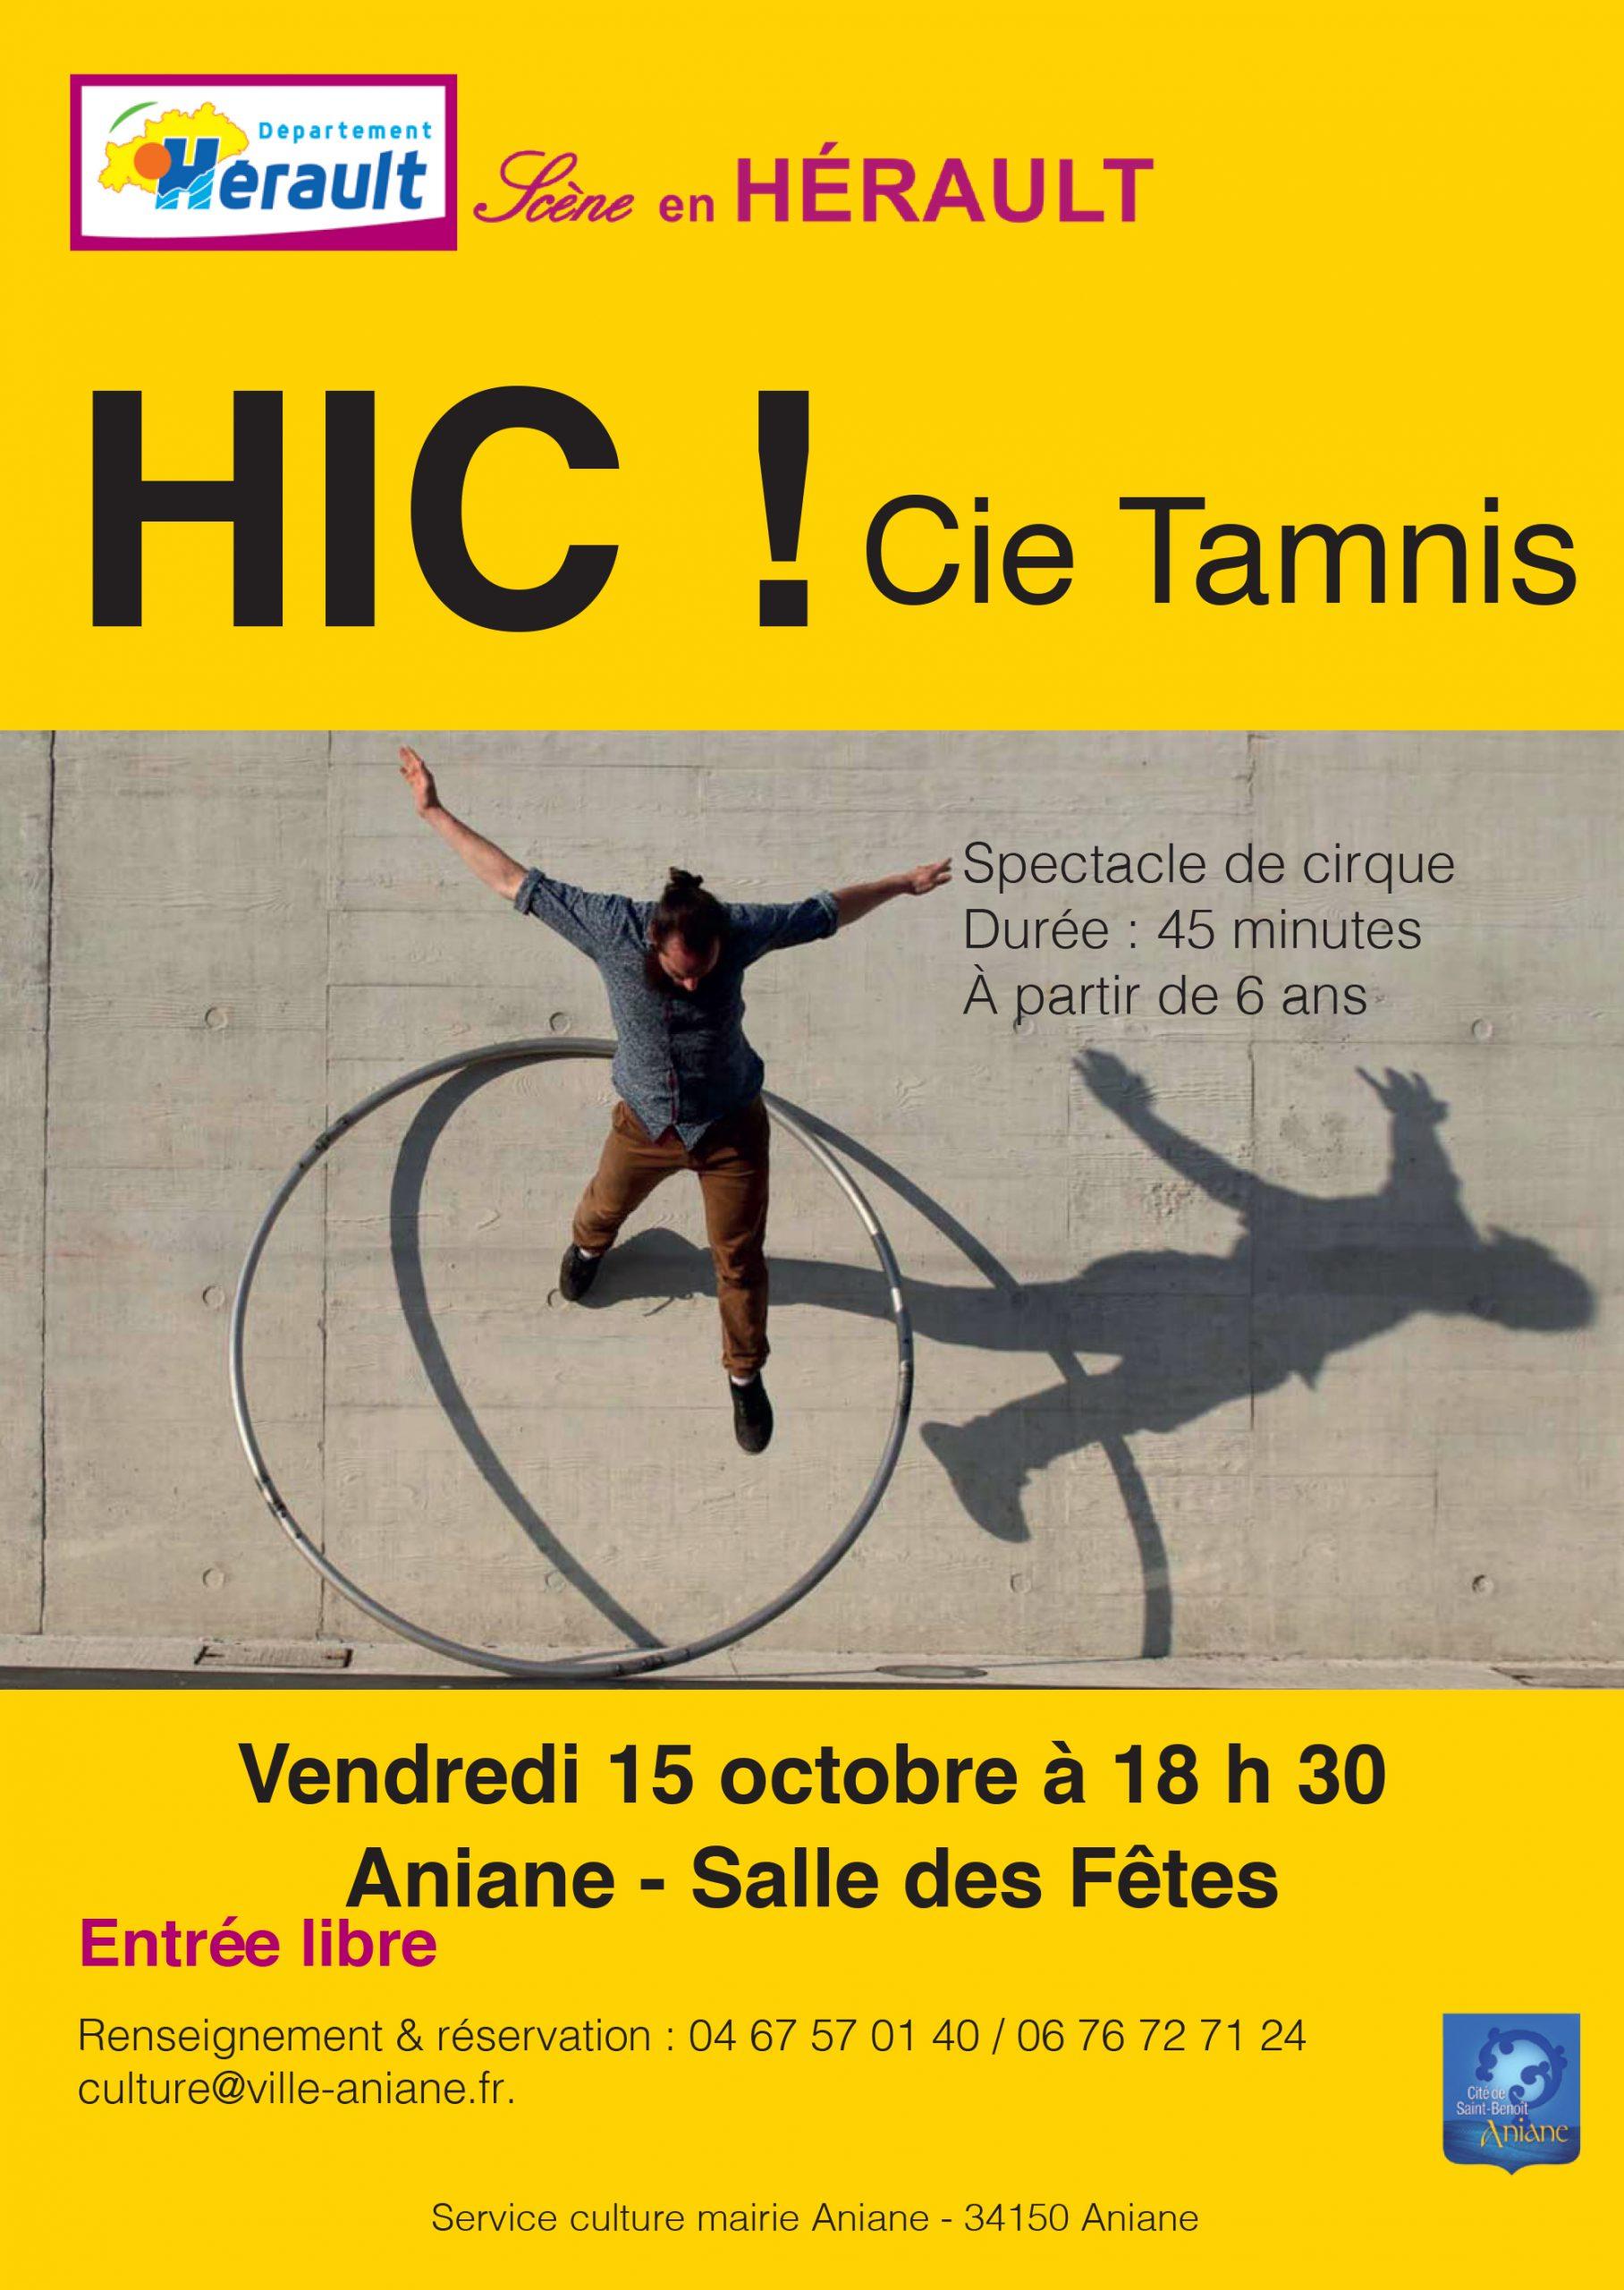 CIE TANMIS HIC-1